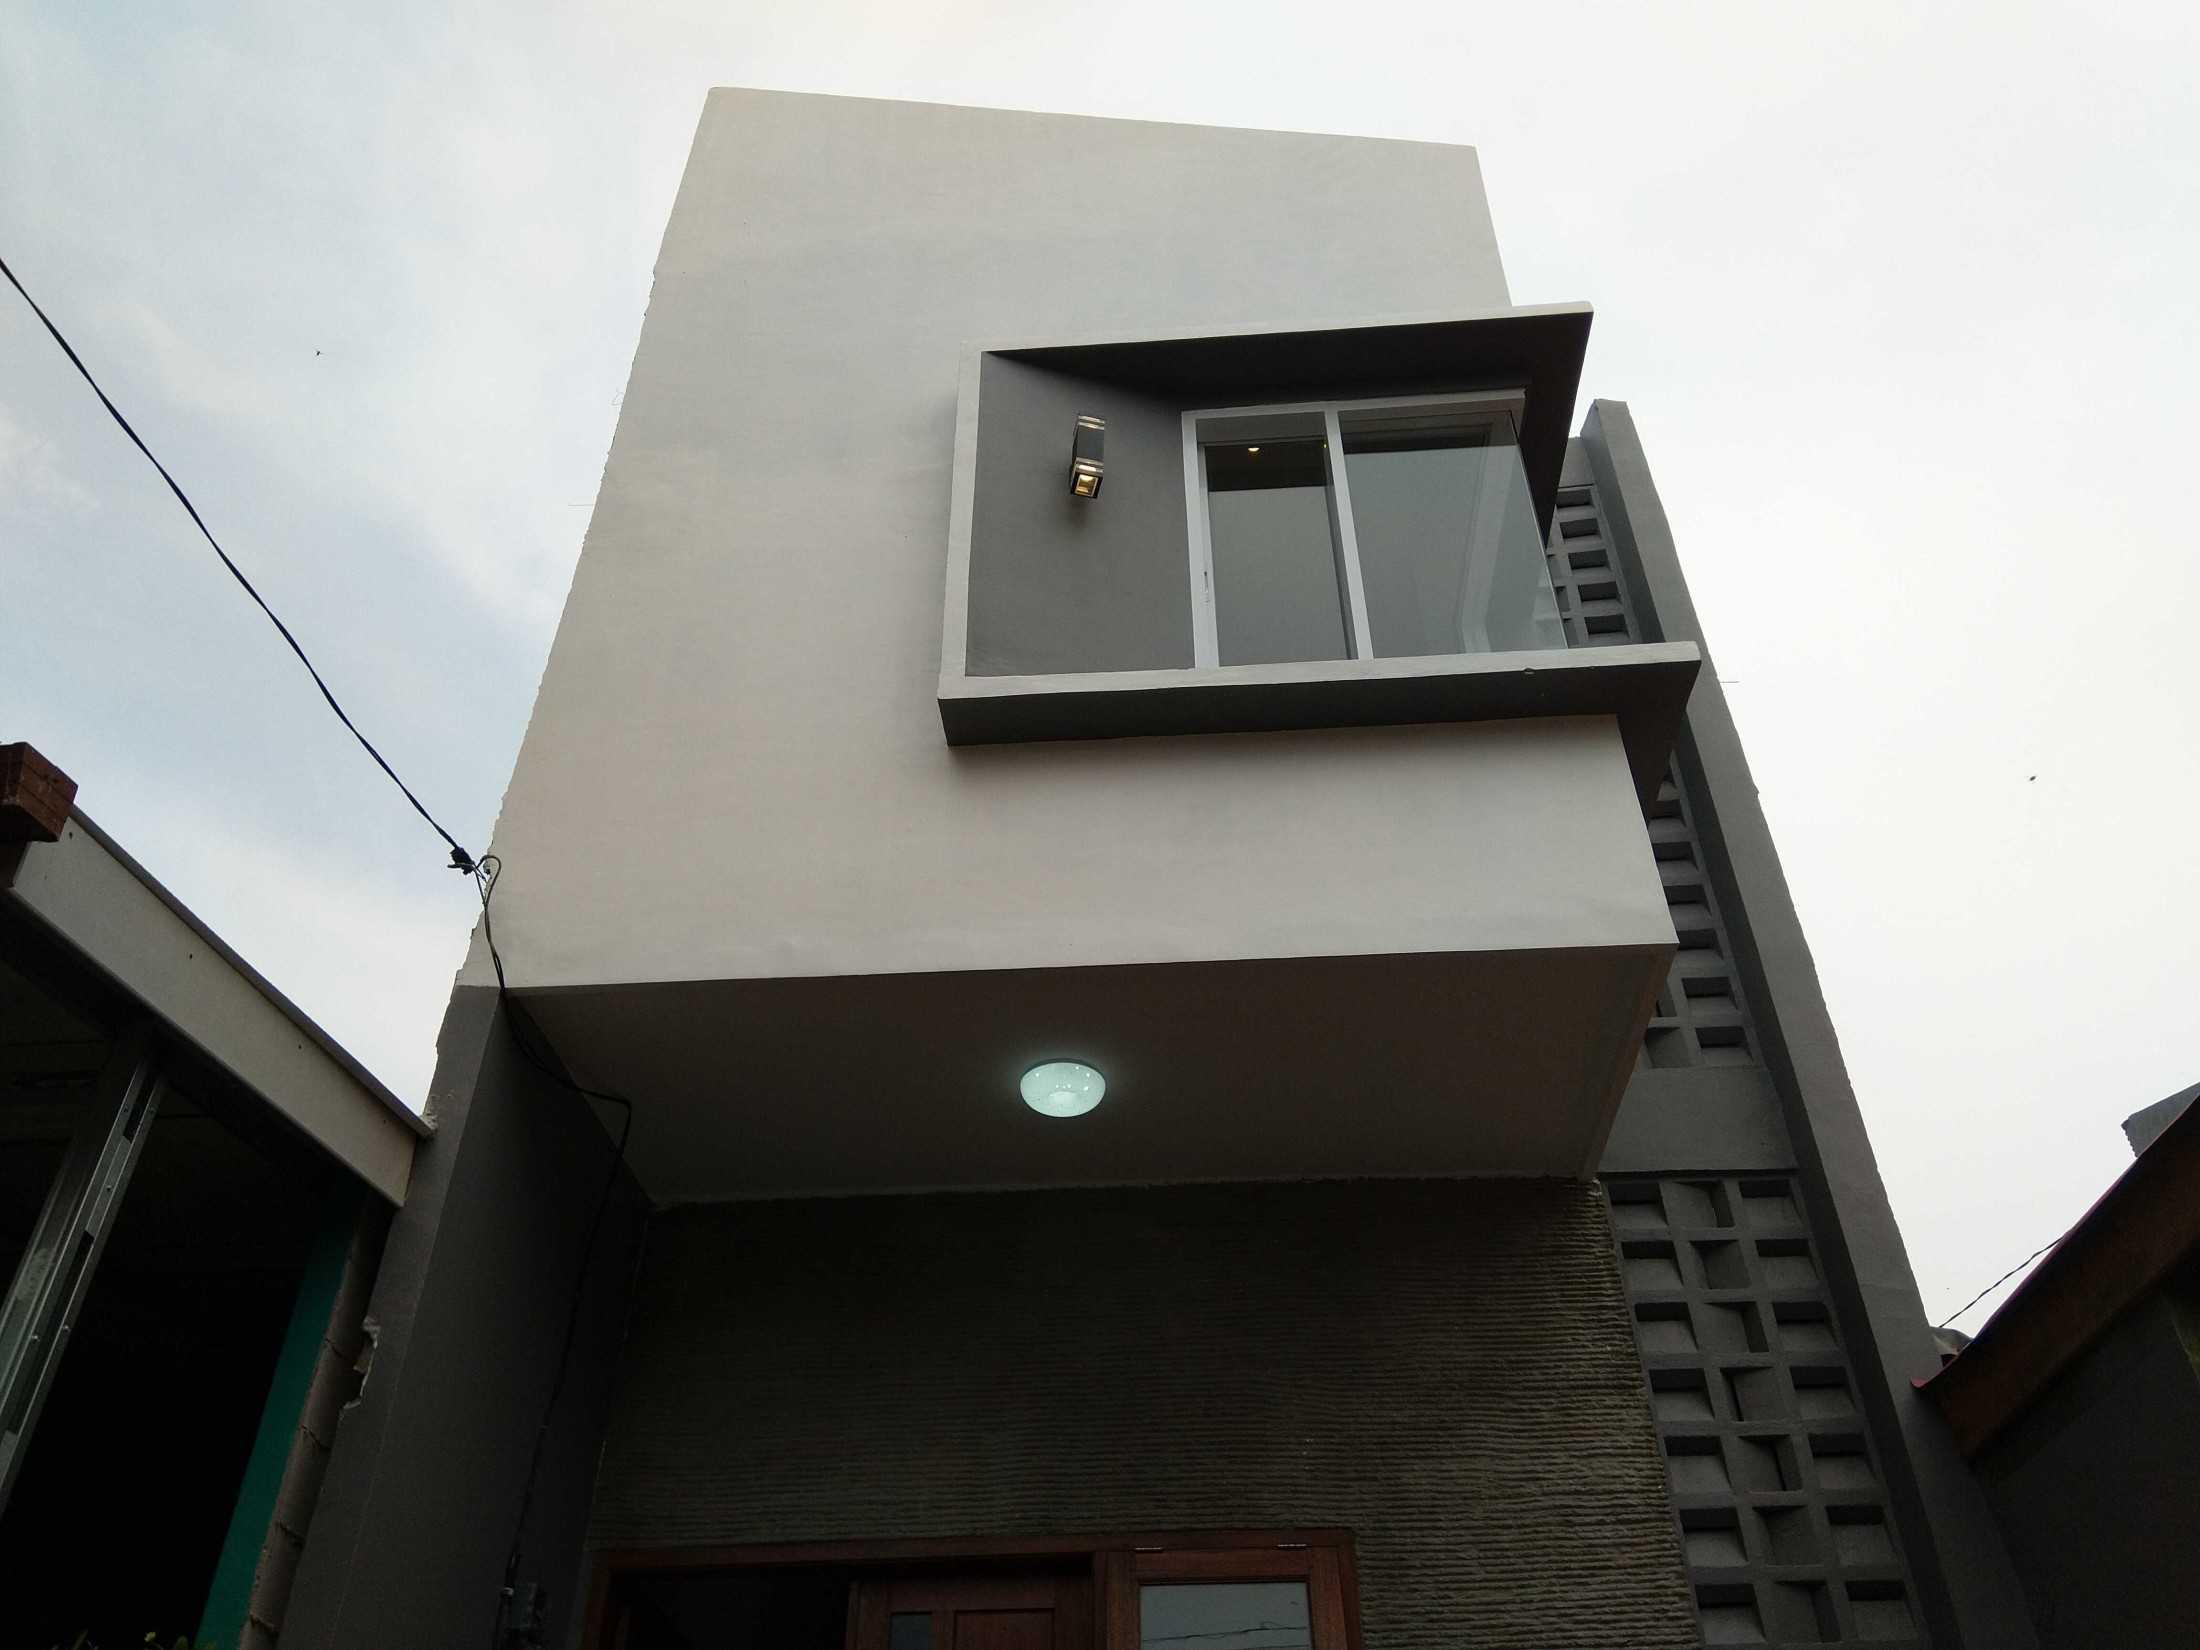 Sutastudio Alwi House Bintara, Bekasi Bar., Kota Bks, Jawa Barat, Indonesia Bintara, Bekasi Bar., Kota Bks, Jawa Barat, Indonesia Sutastudio-Alwi-House  64584